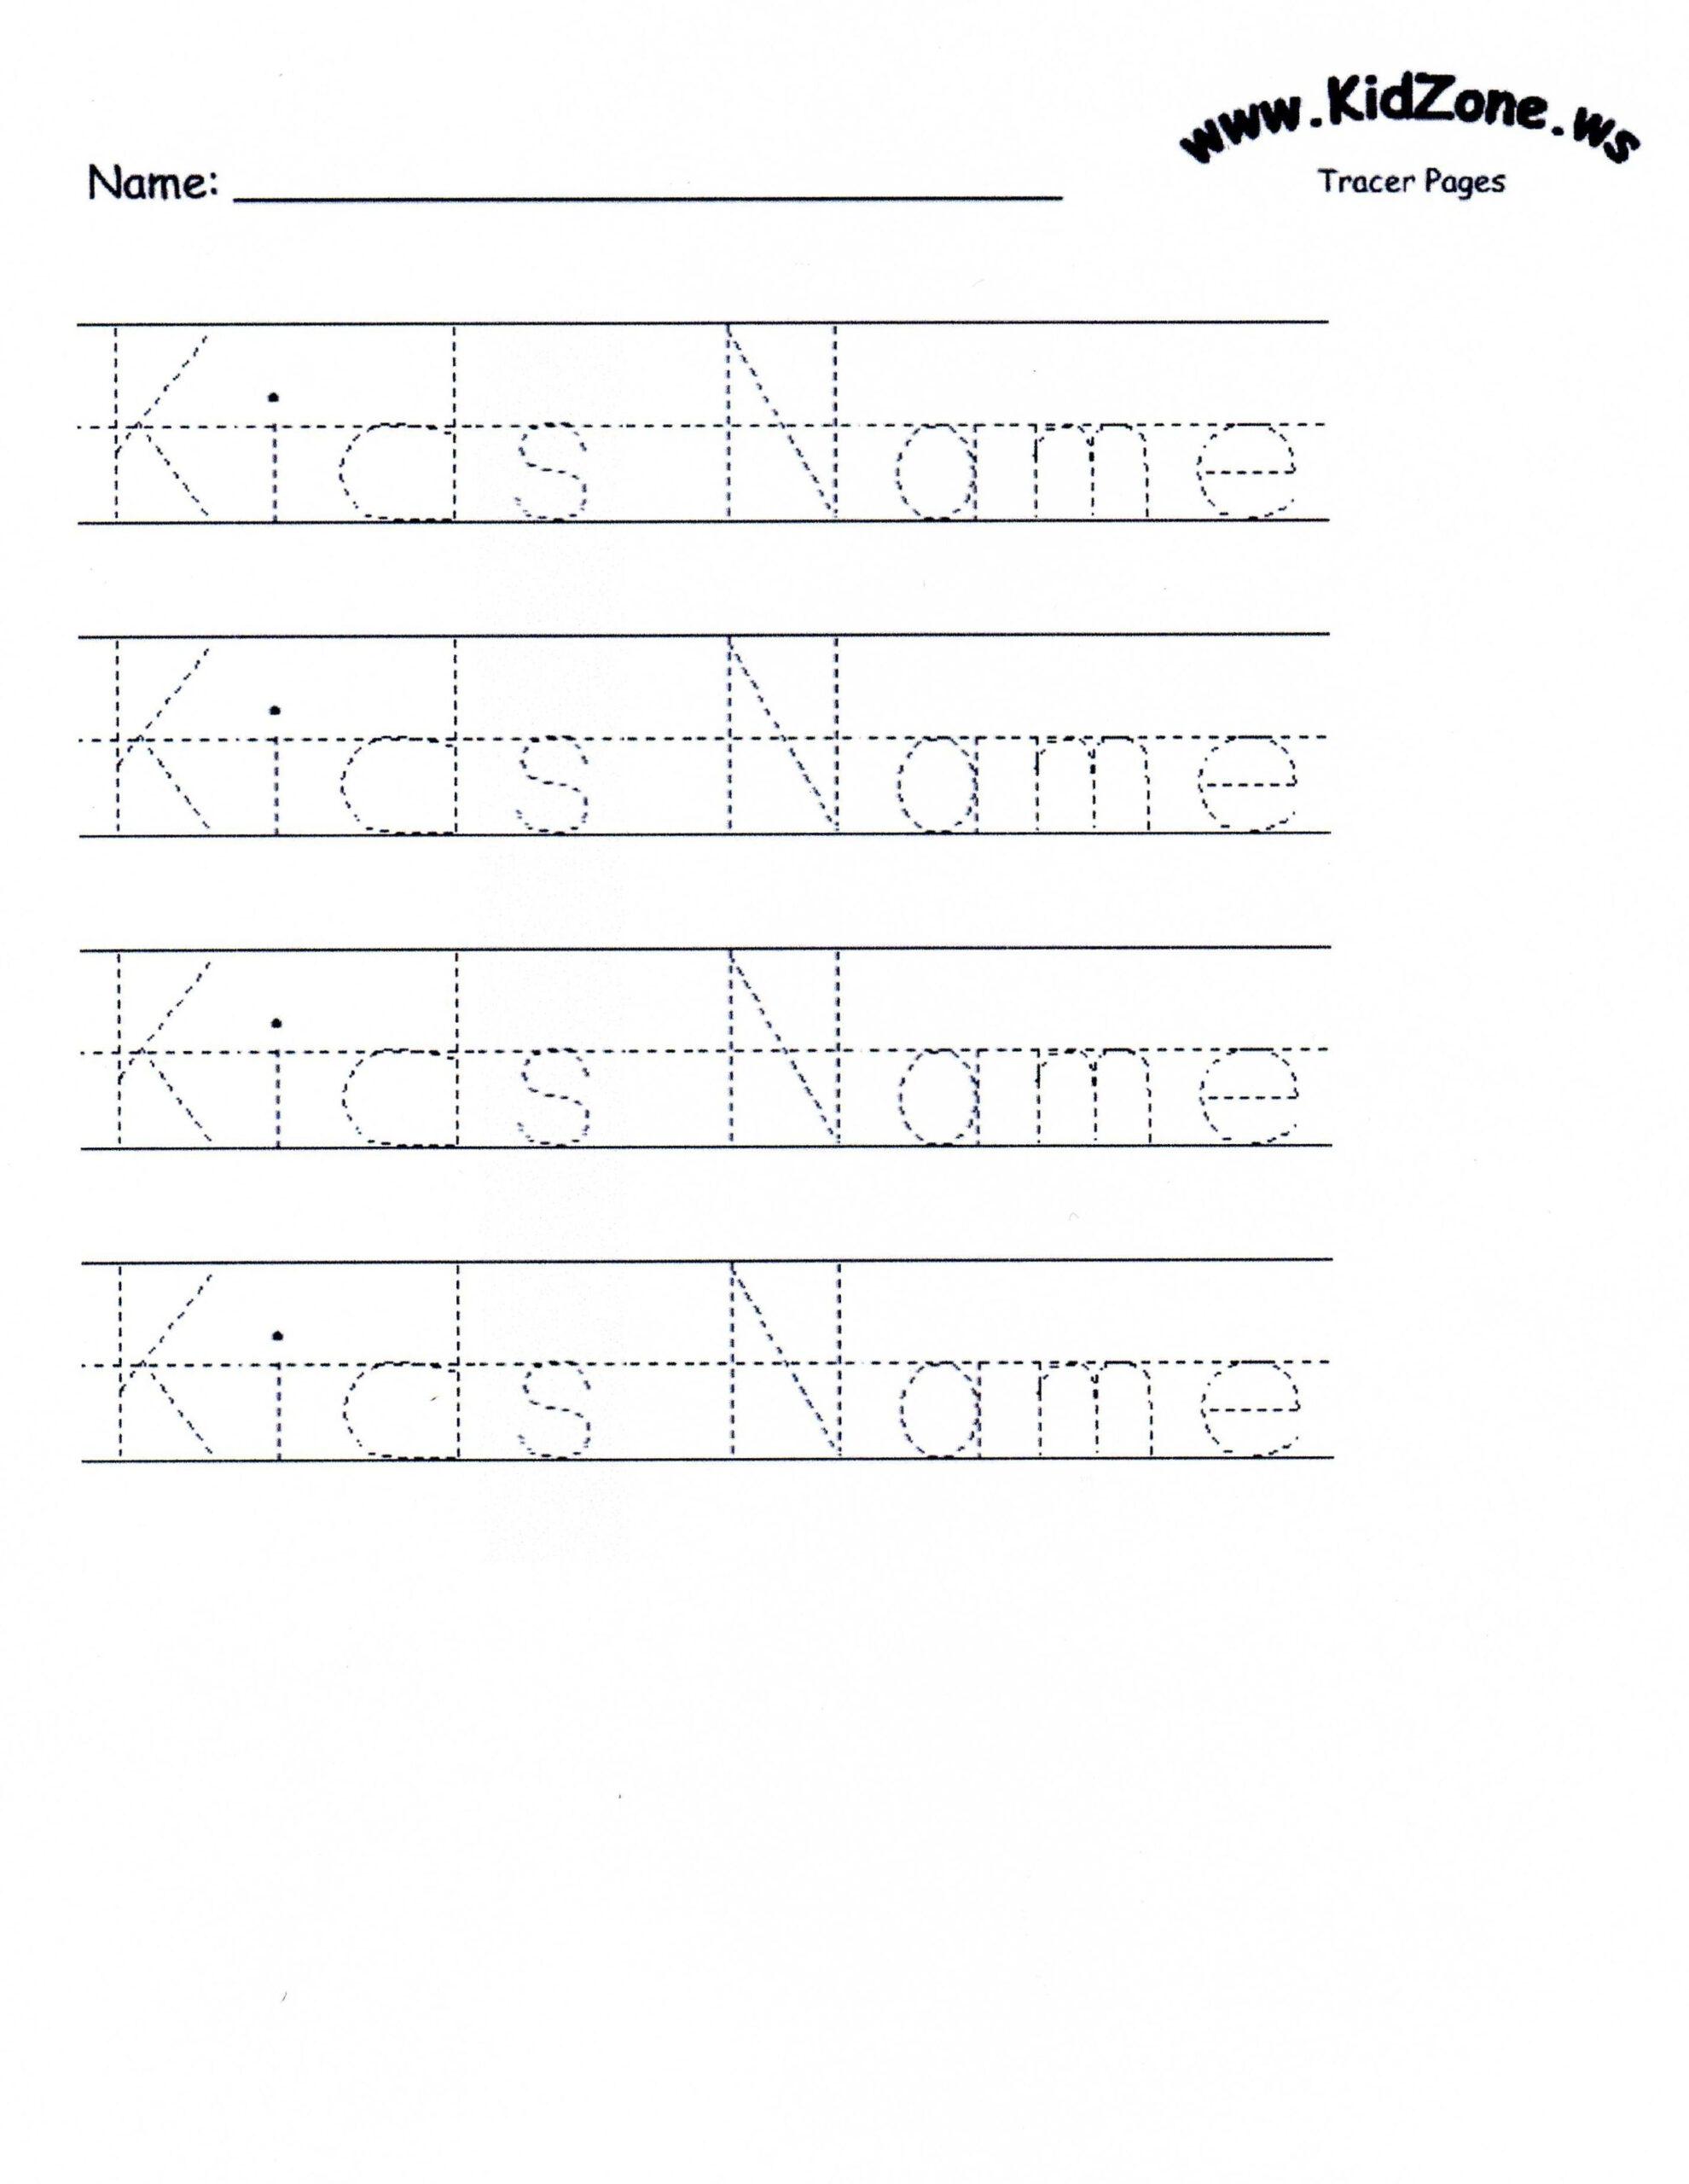 Tracing Name Templates - The Future